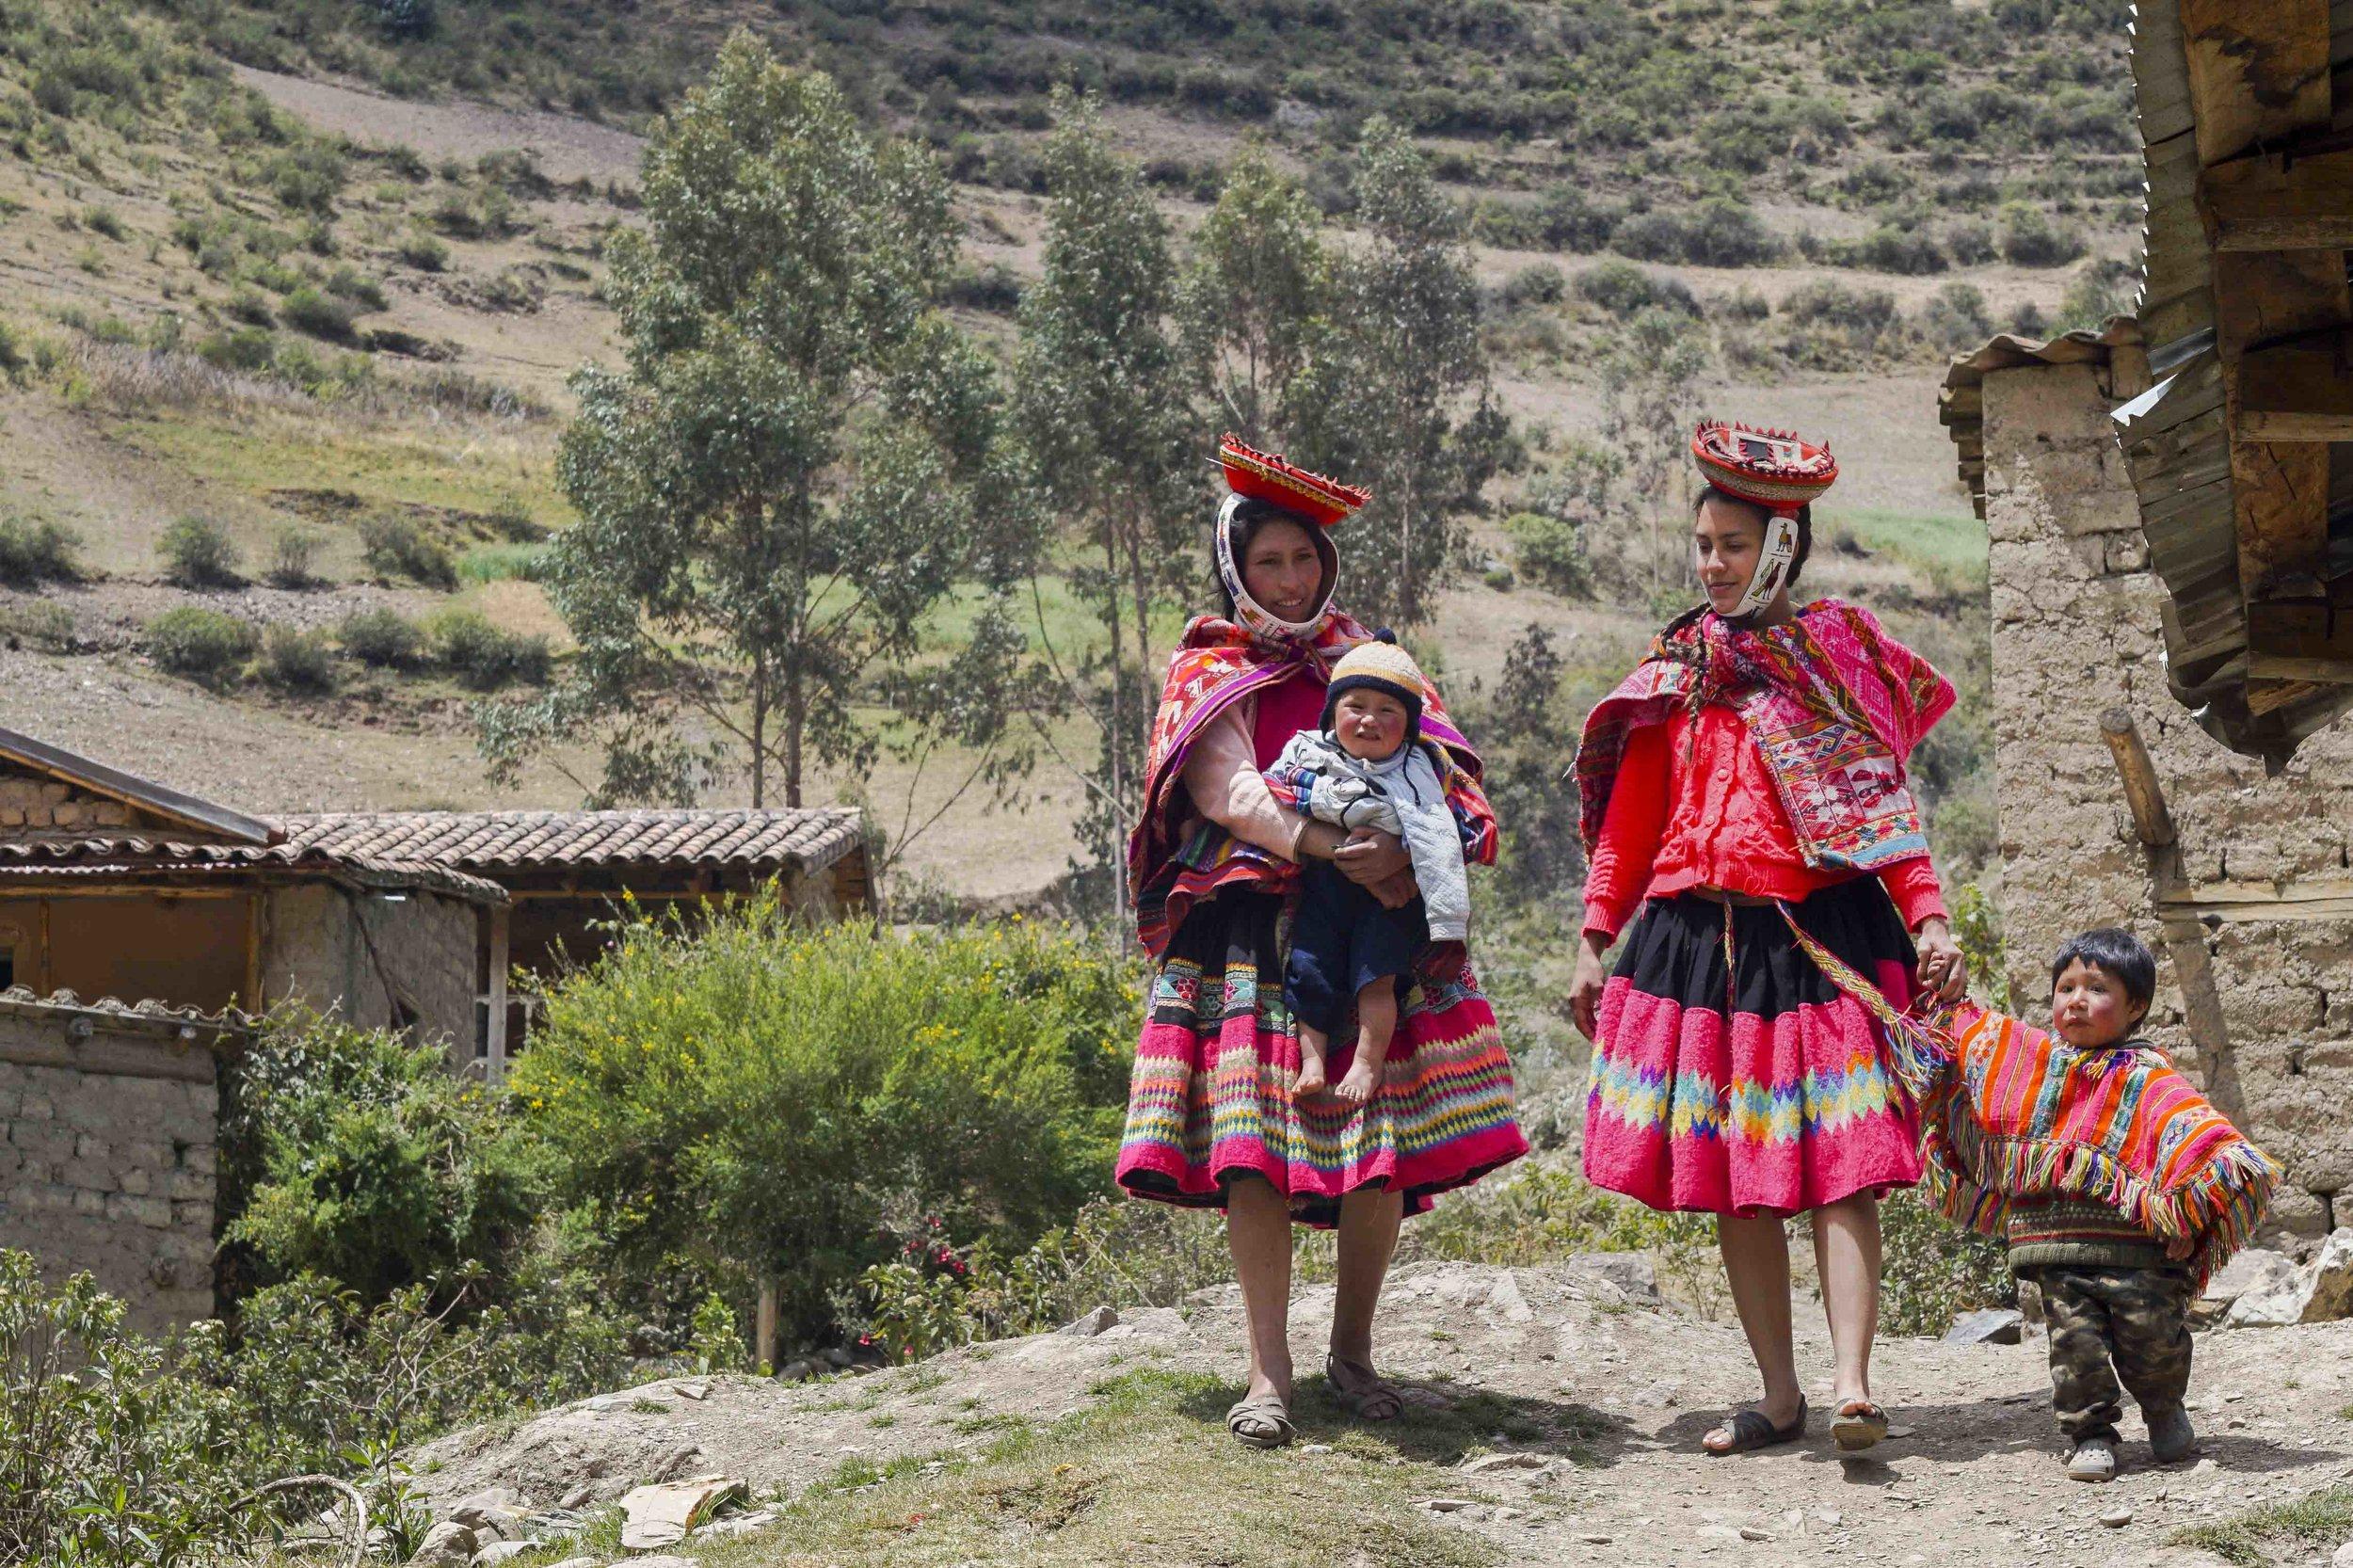 Peruvian Mother in Huilloc |  Madre Peruana en Huilloc  (2018)